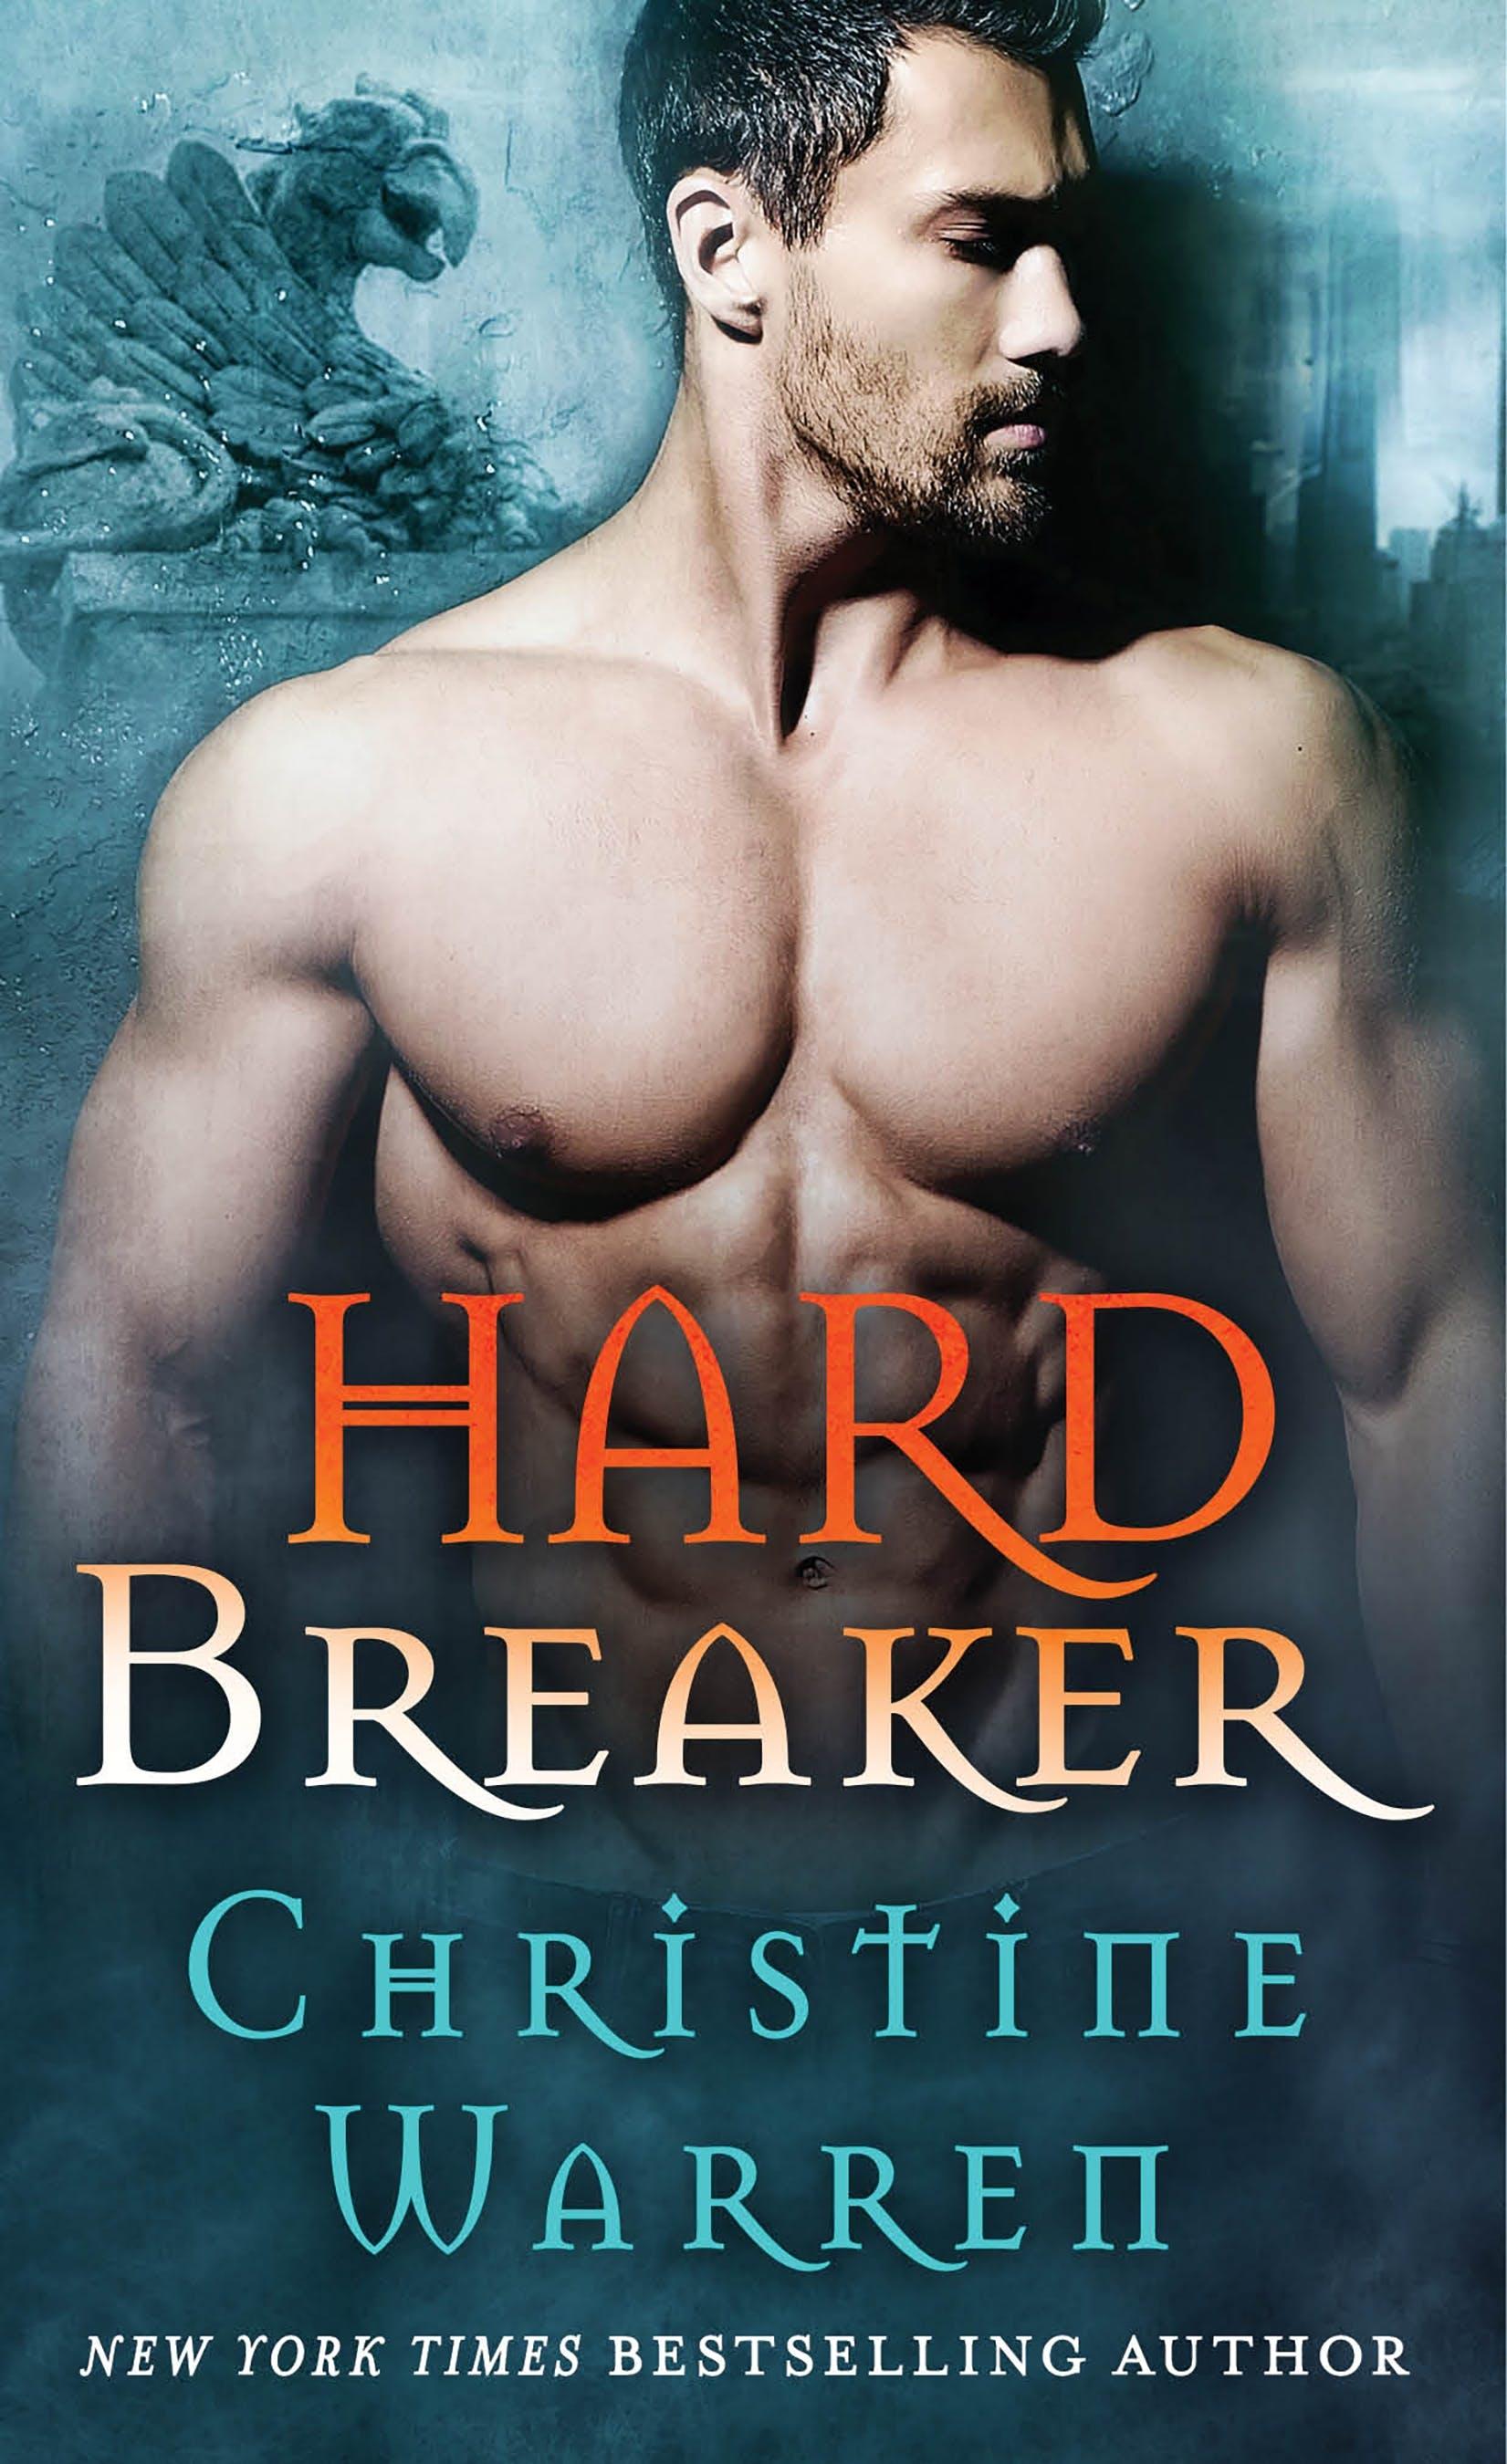 Image of Hard Breaker